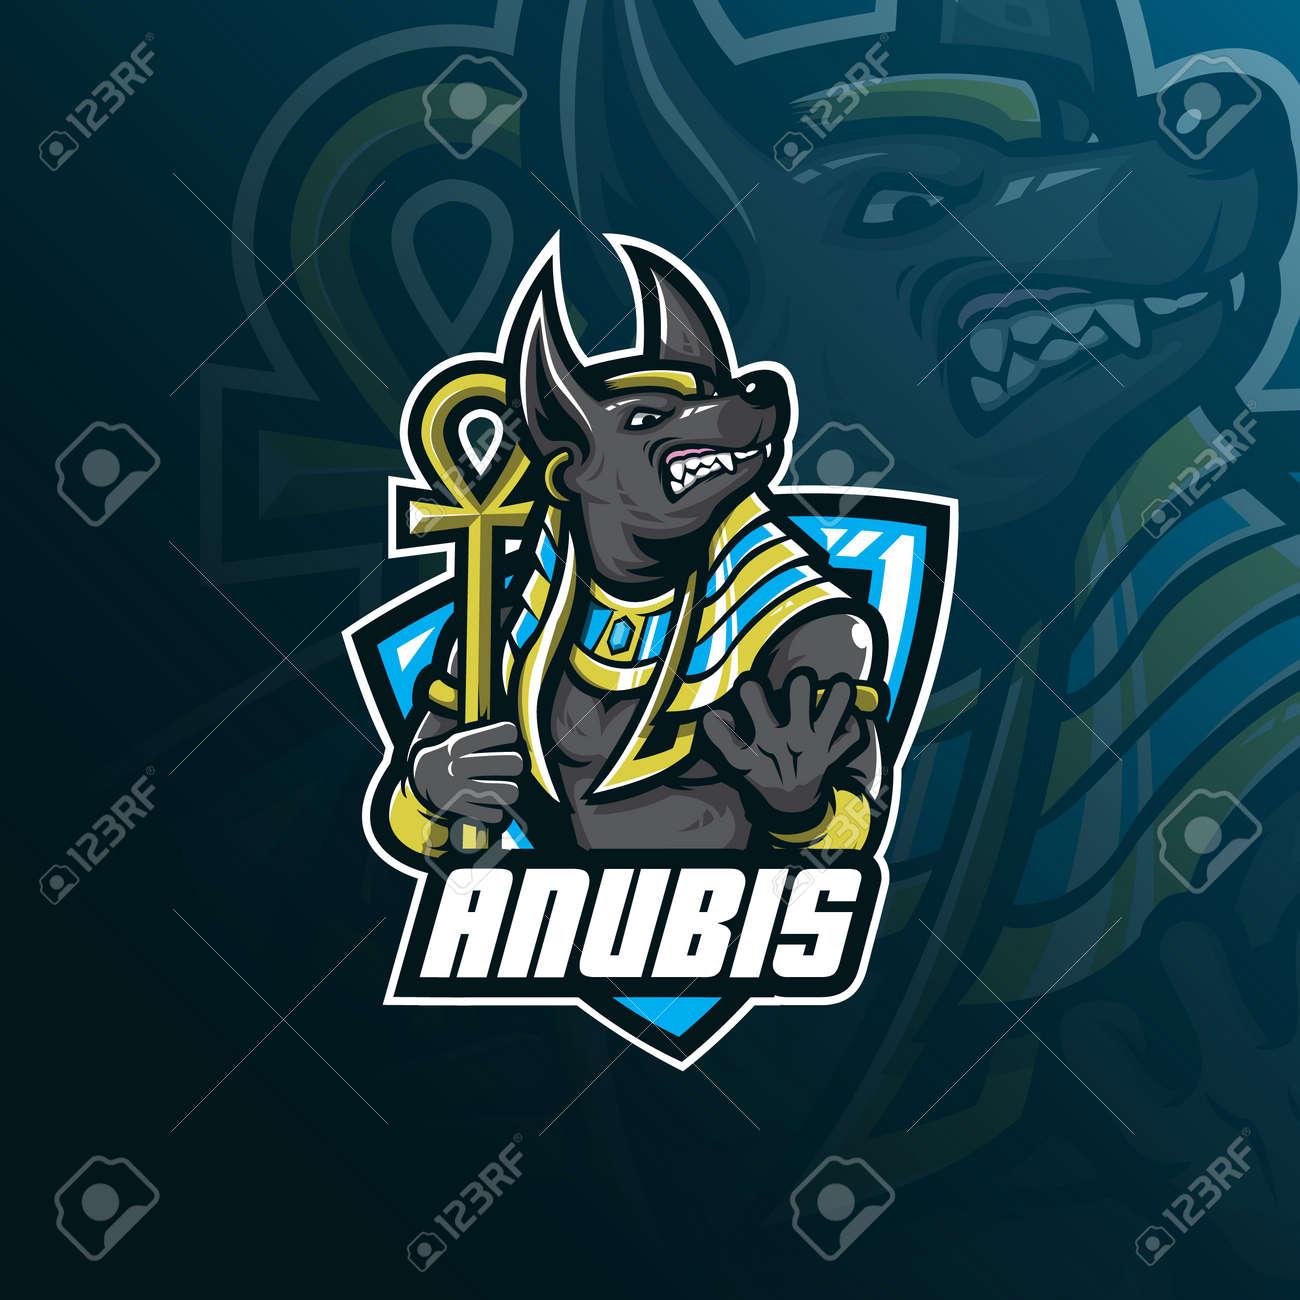 anubis vector mascot logo design with modern illustration concept